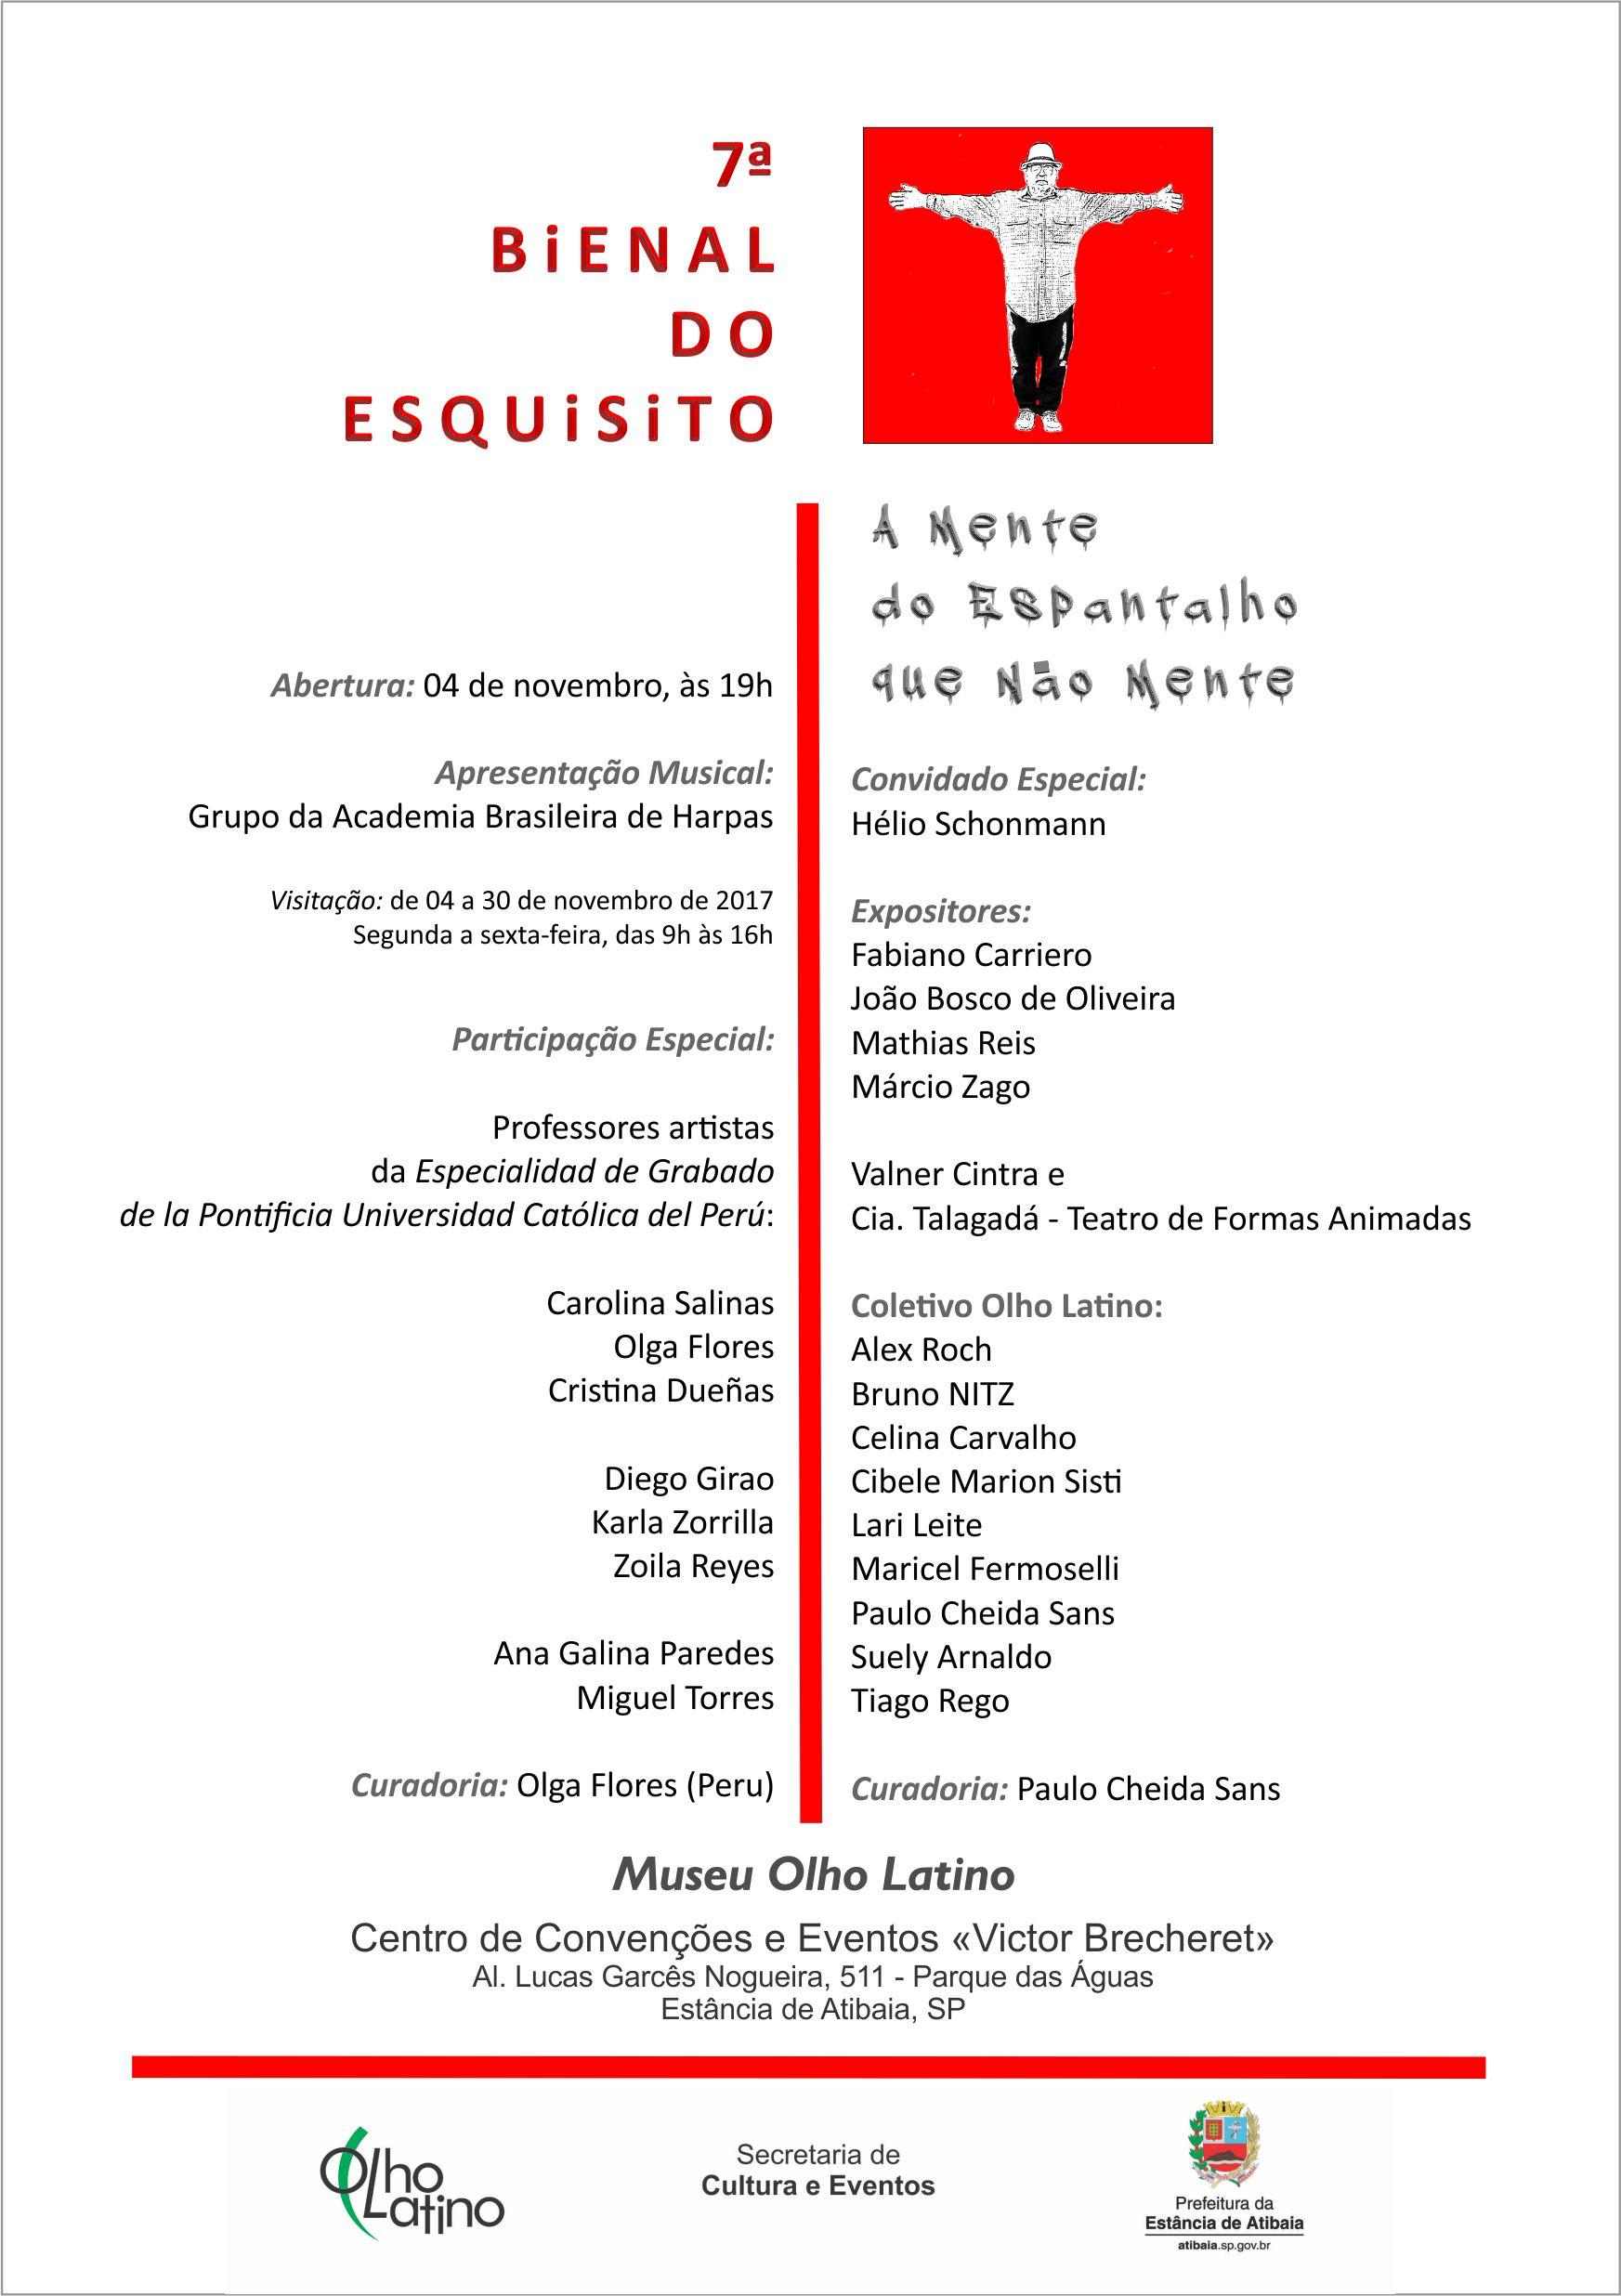 convite 7 bienal do esquisito museu olho latino